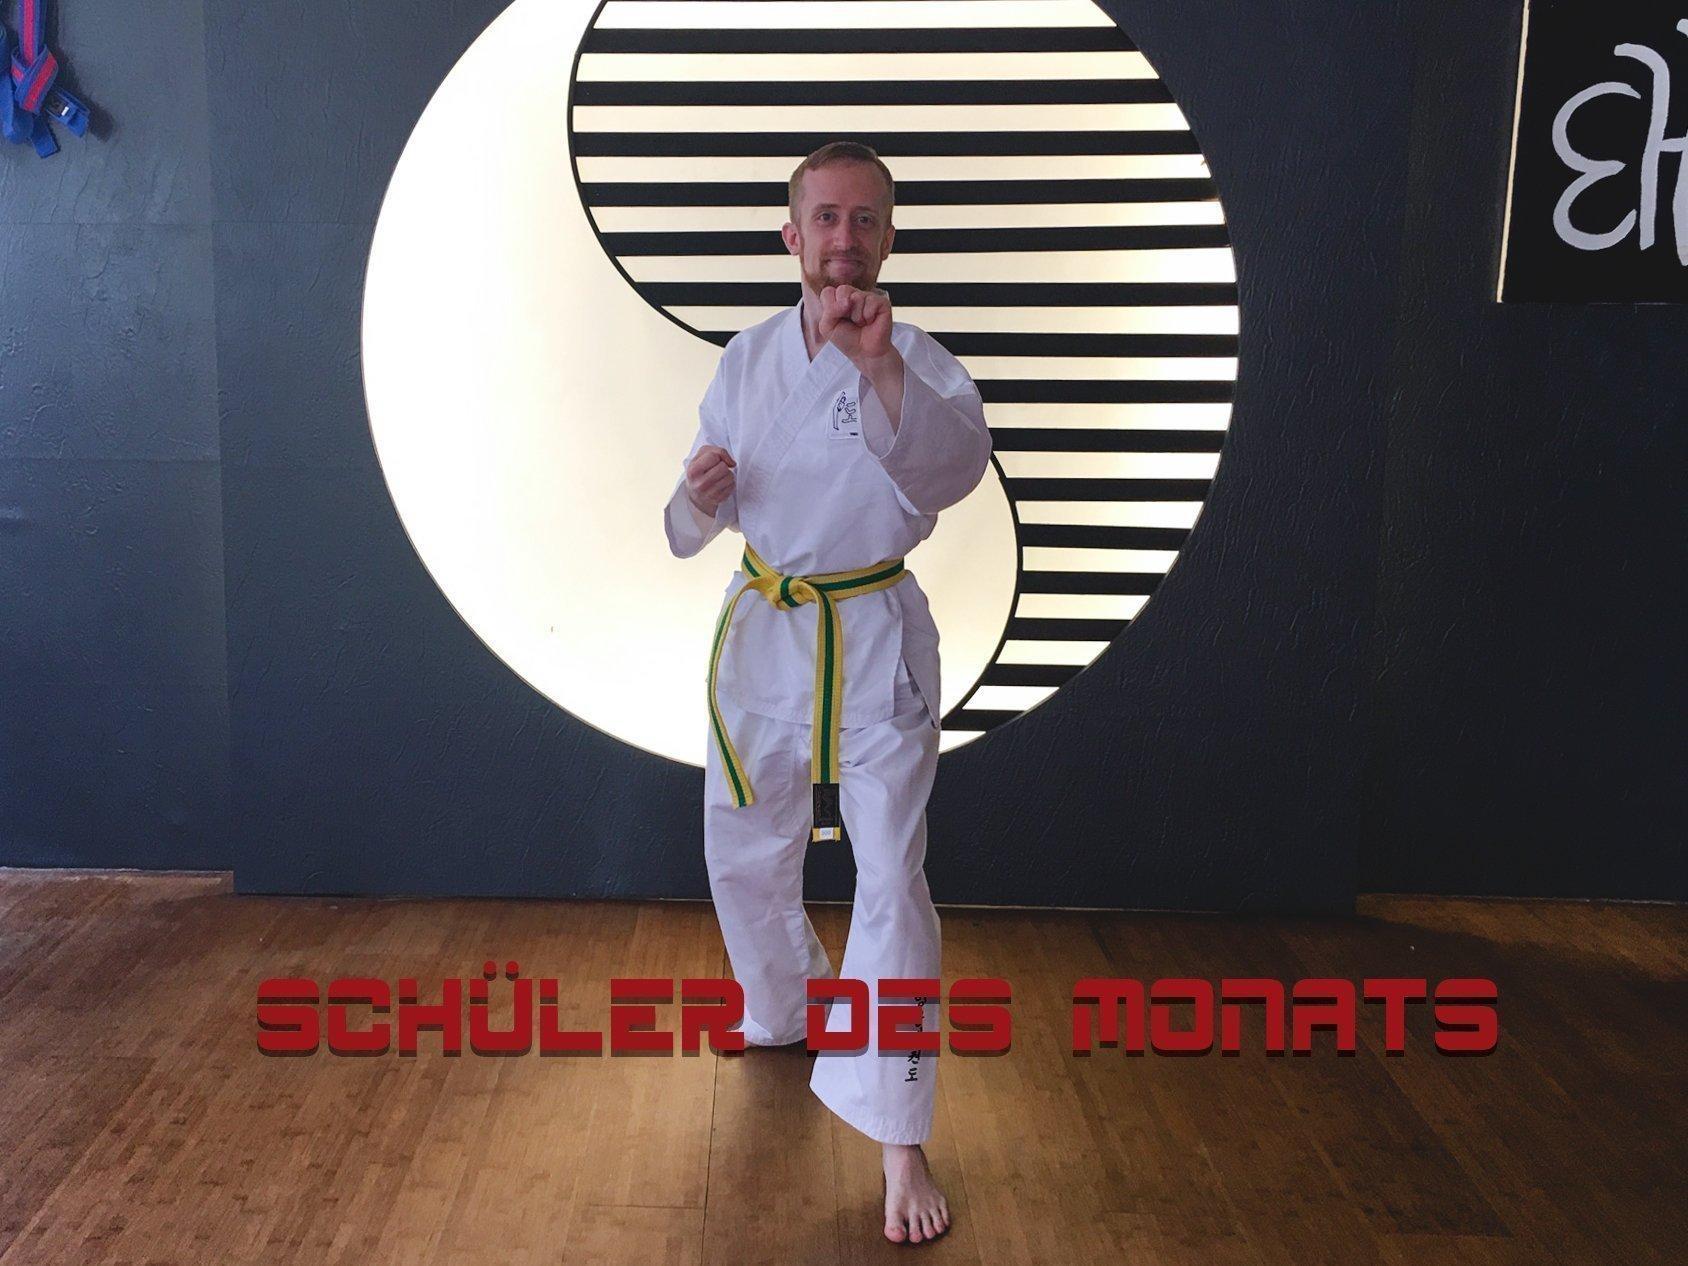 YOUNG-UNG Taekwondo Schüler des Monats Thomas Mitzka